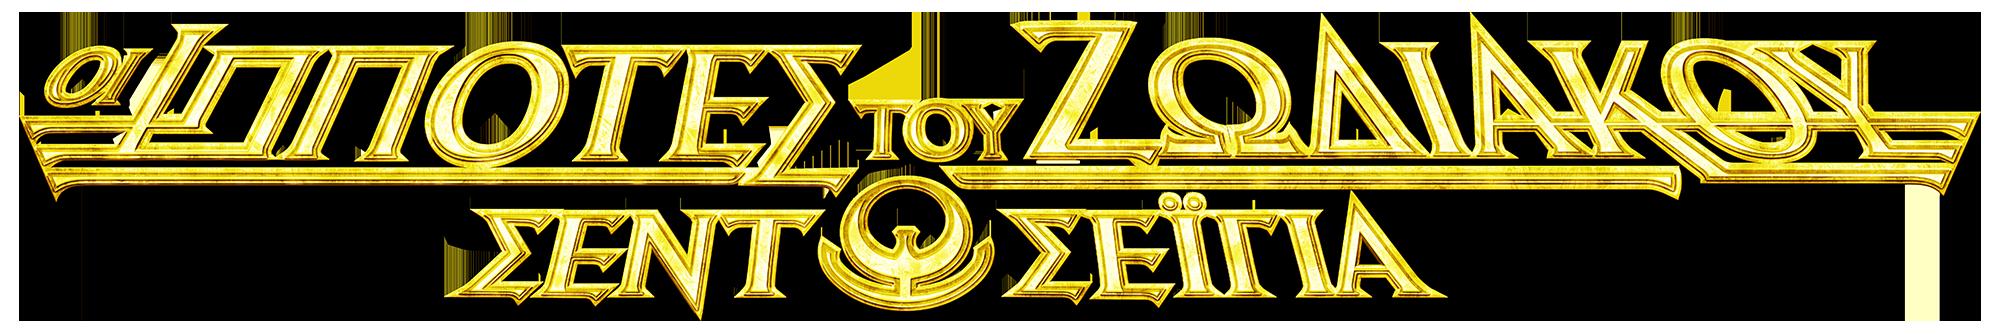 Saint Seiya Zodiac Knights Greek title design for Netflix